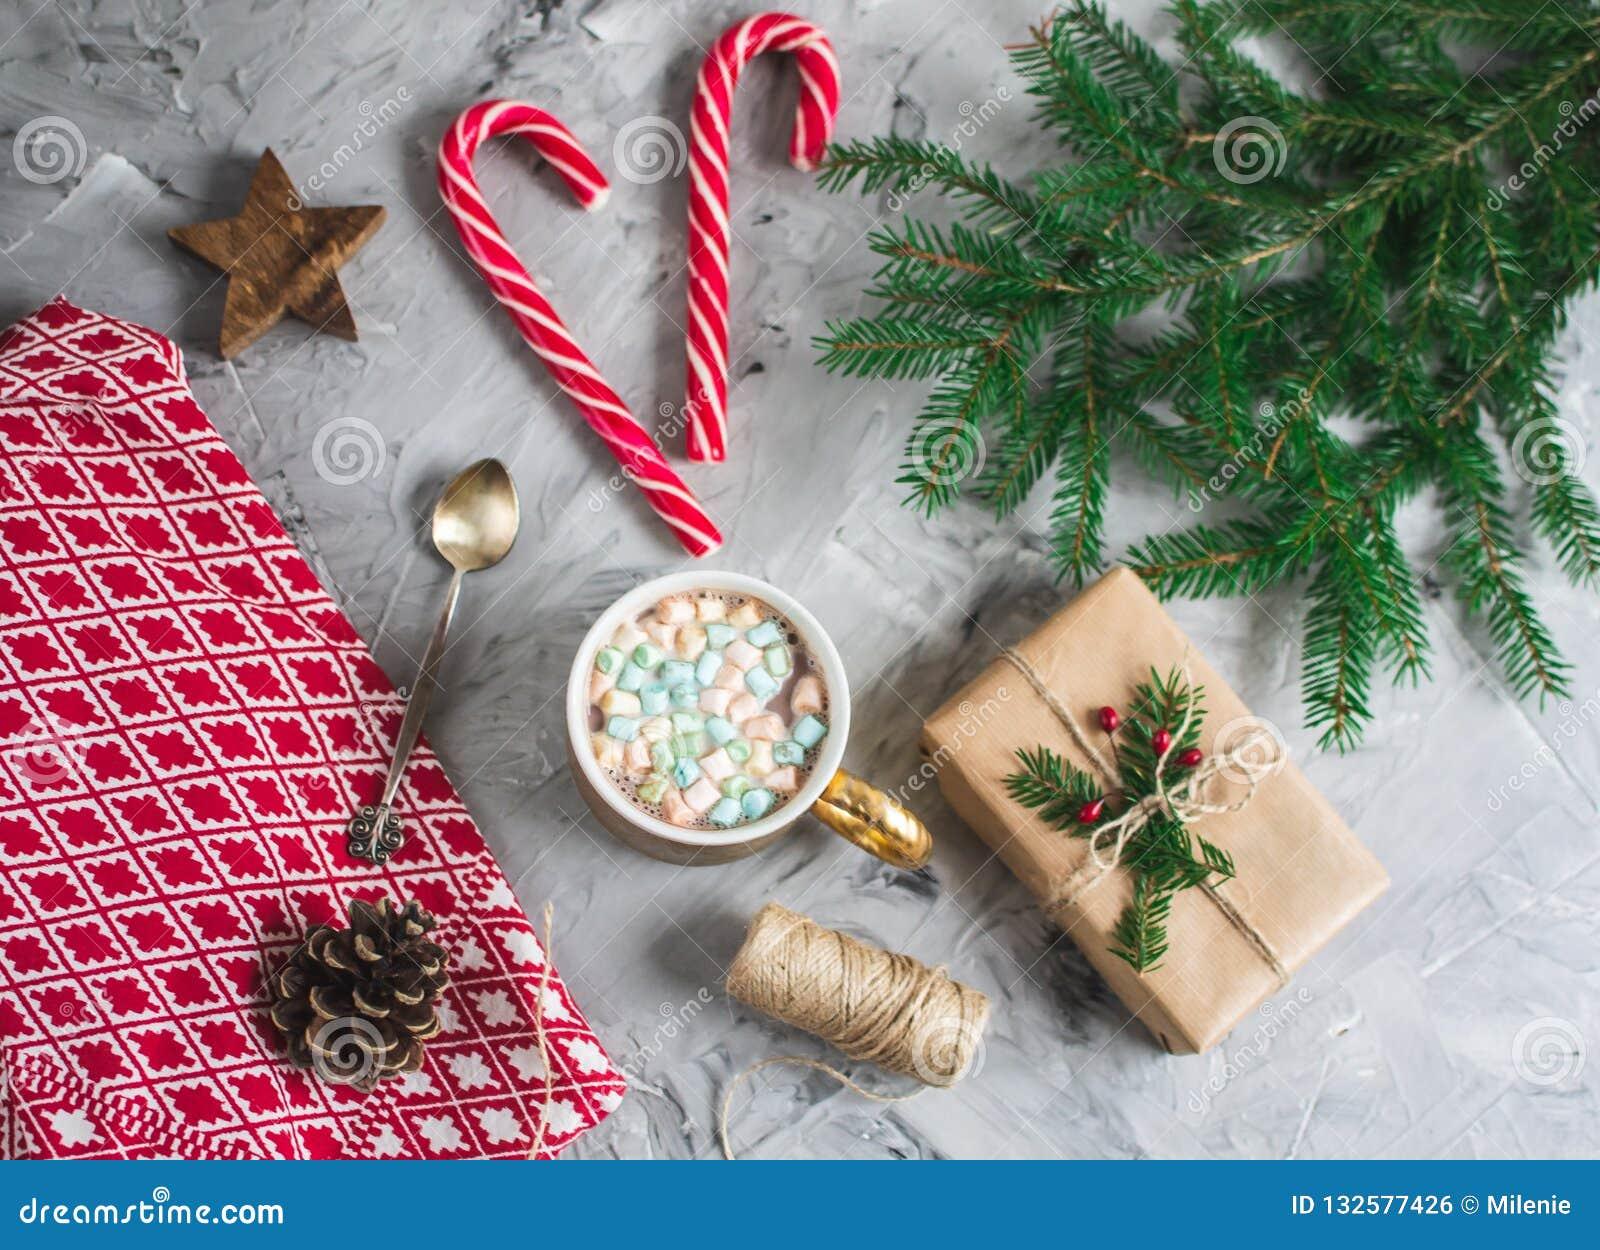 Hot chocolate christmas cones craft